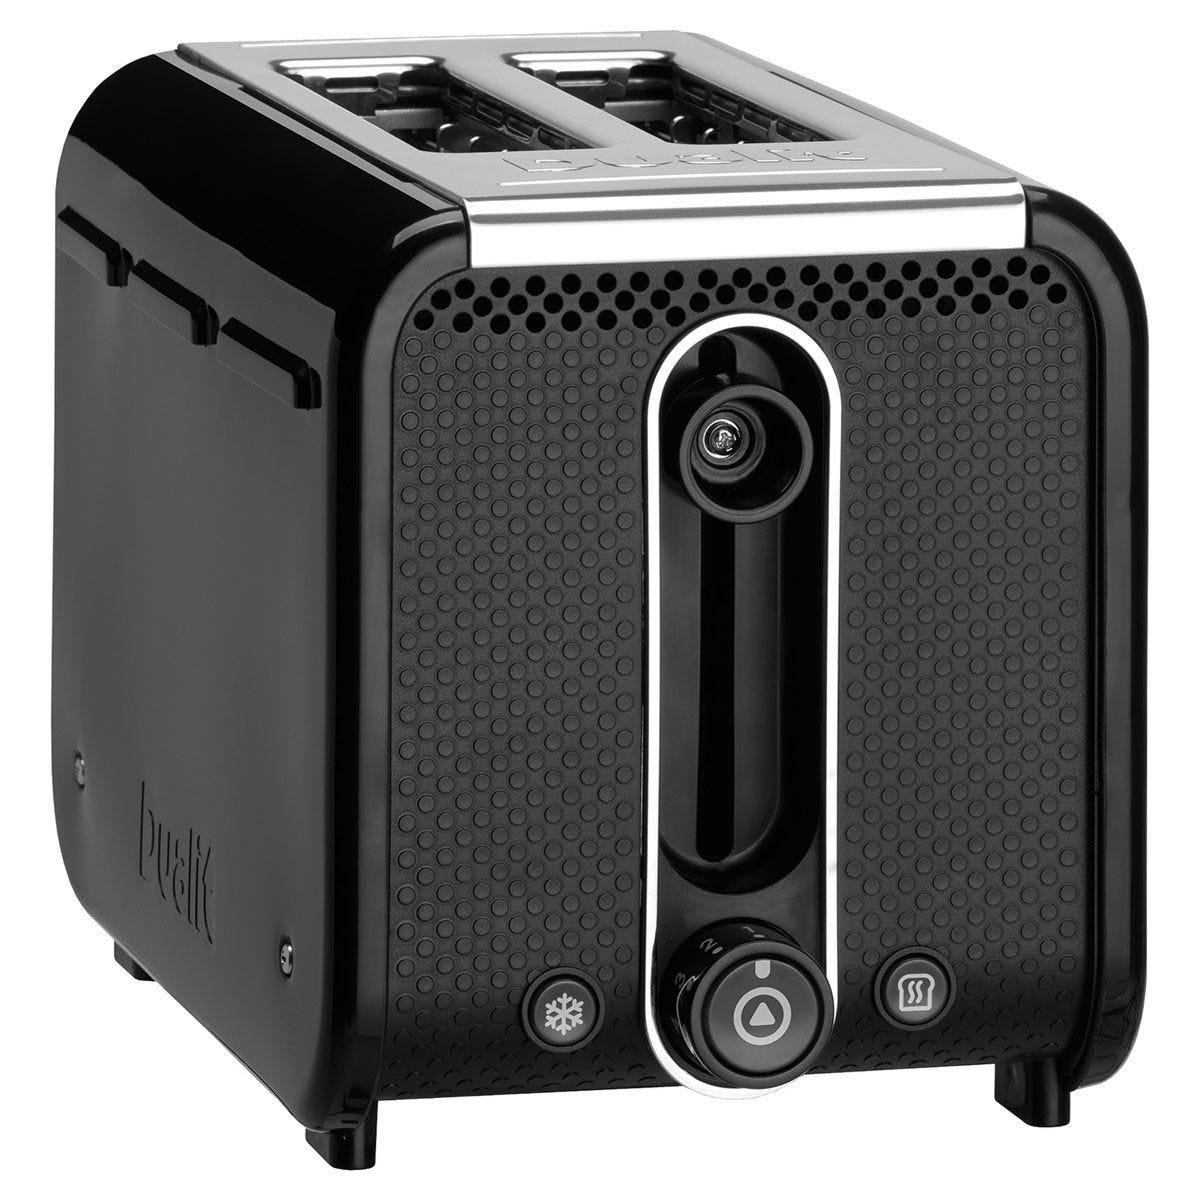 Dualit DA2641 2-Slice Studio Toaster with Removable Crumb Tray- Black